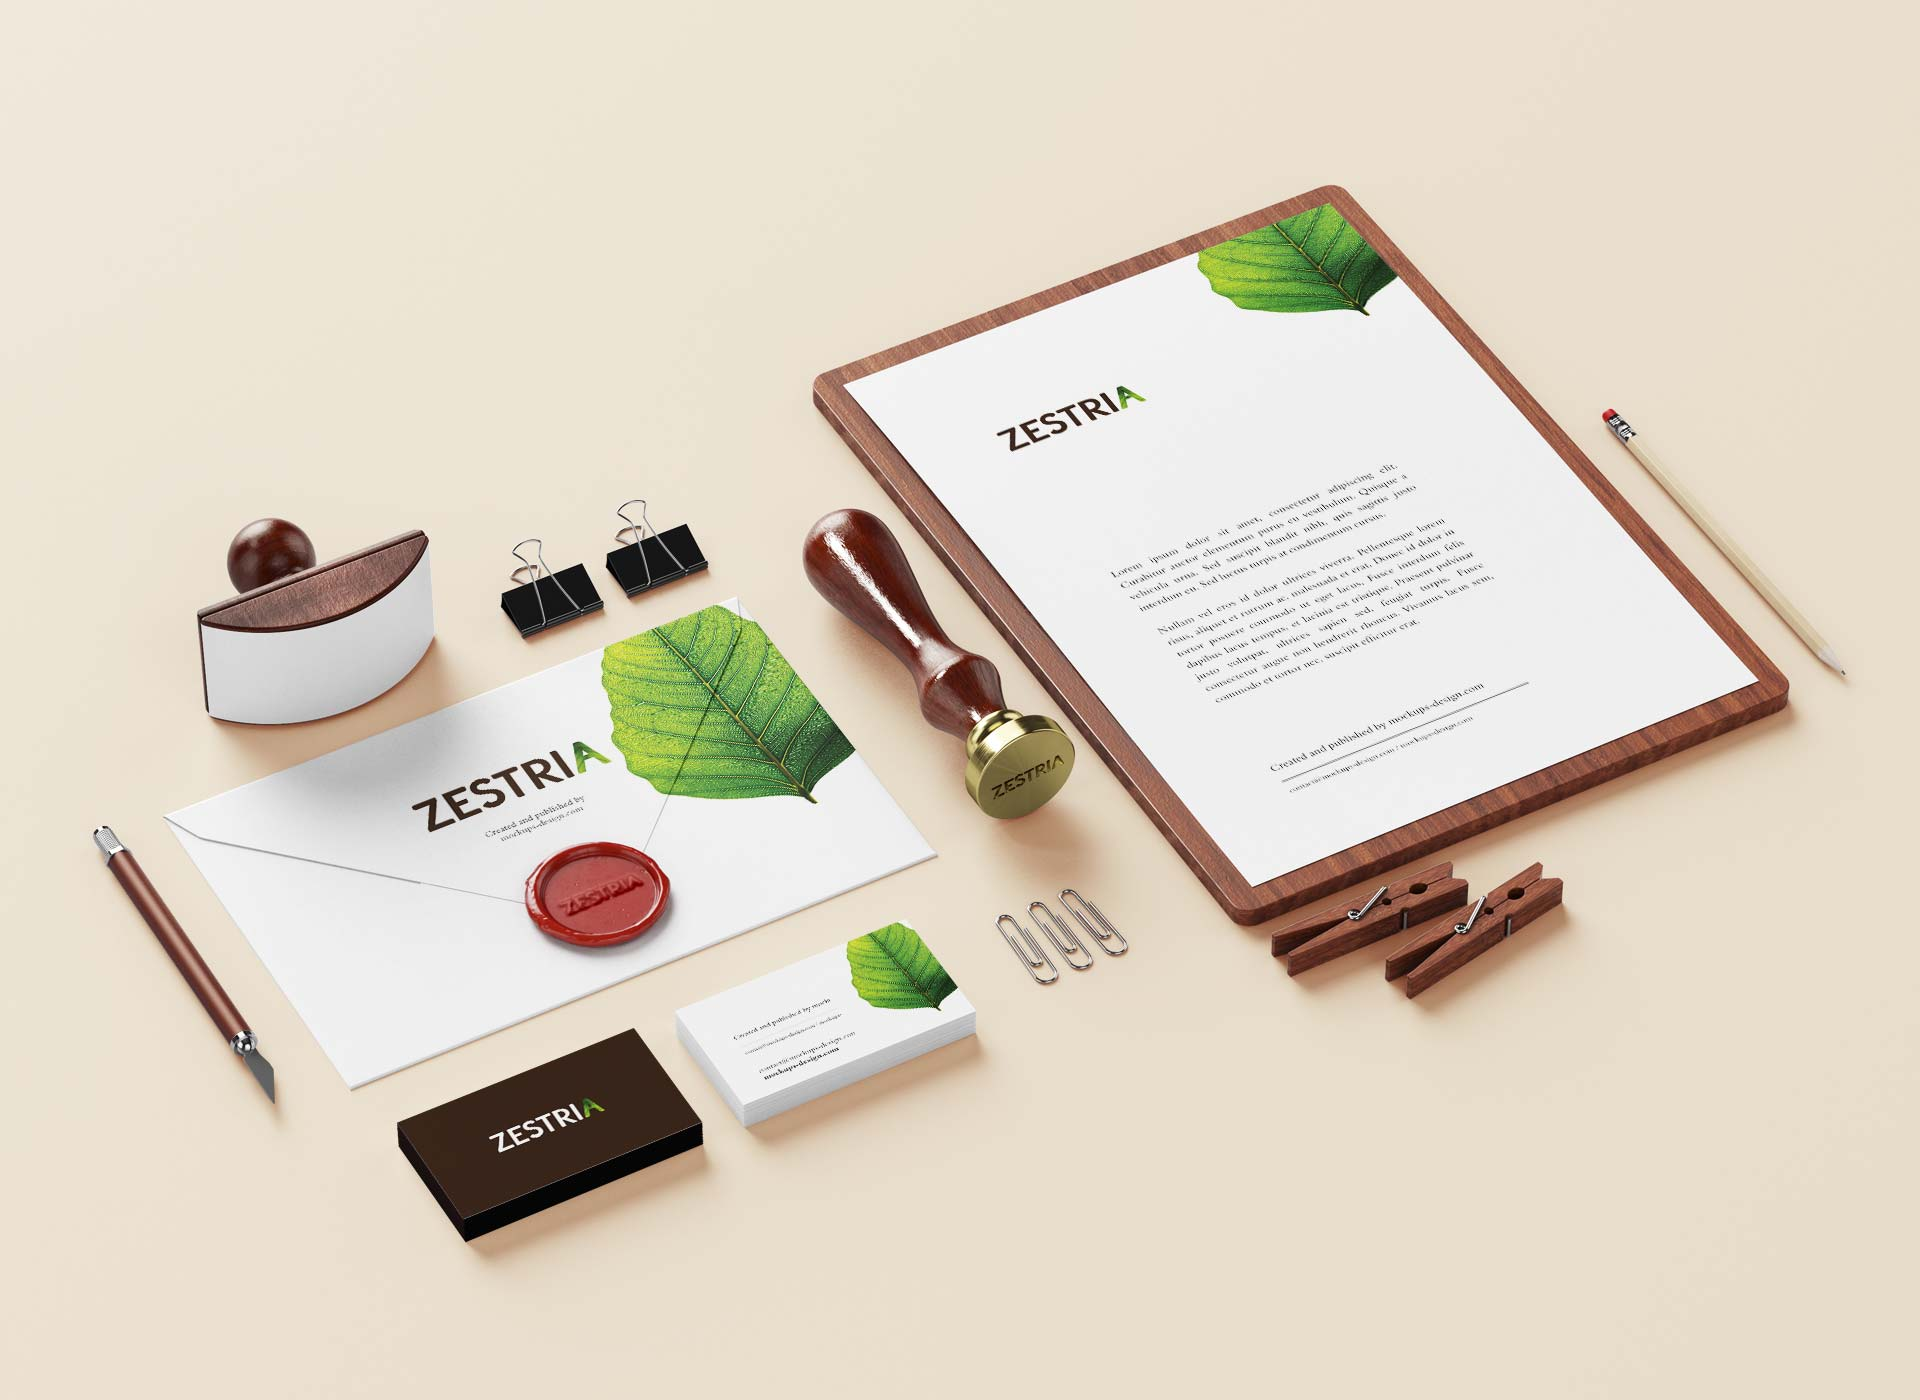 zestria portfolio inoveo stationery